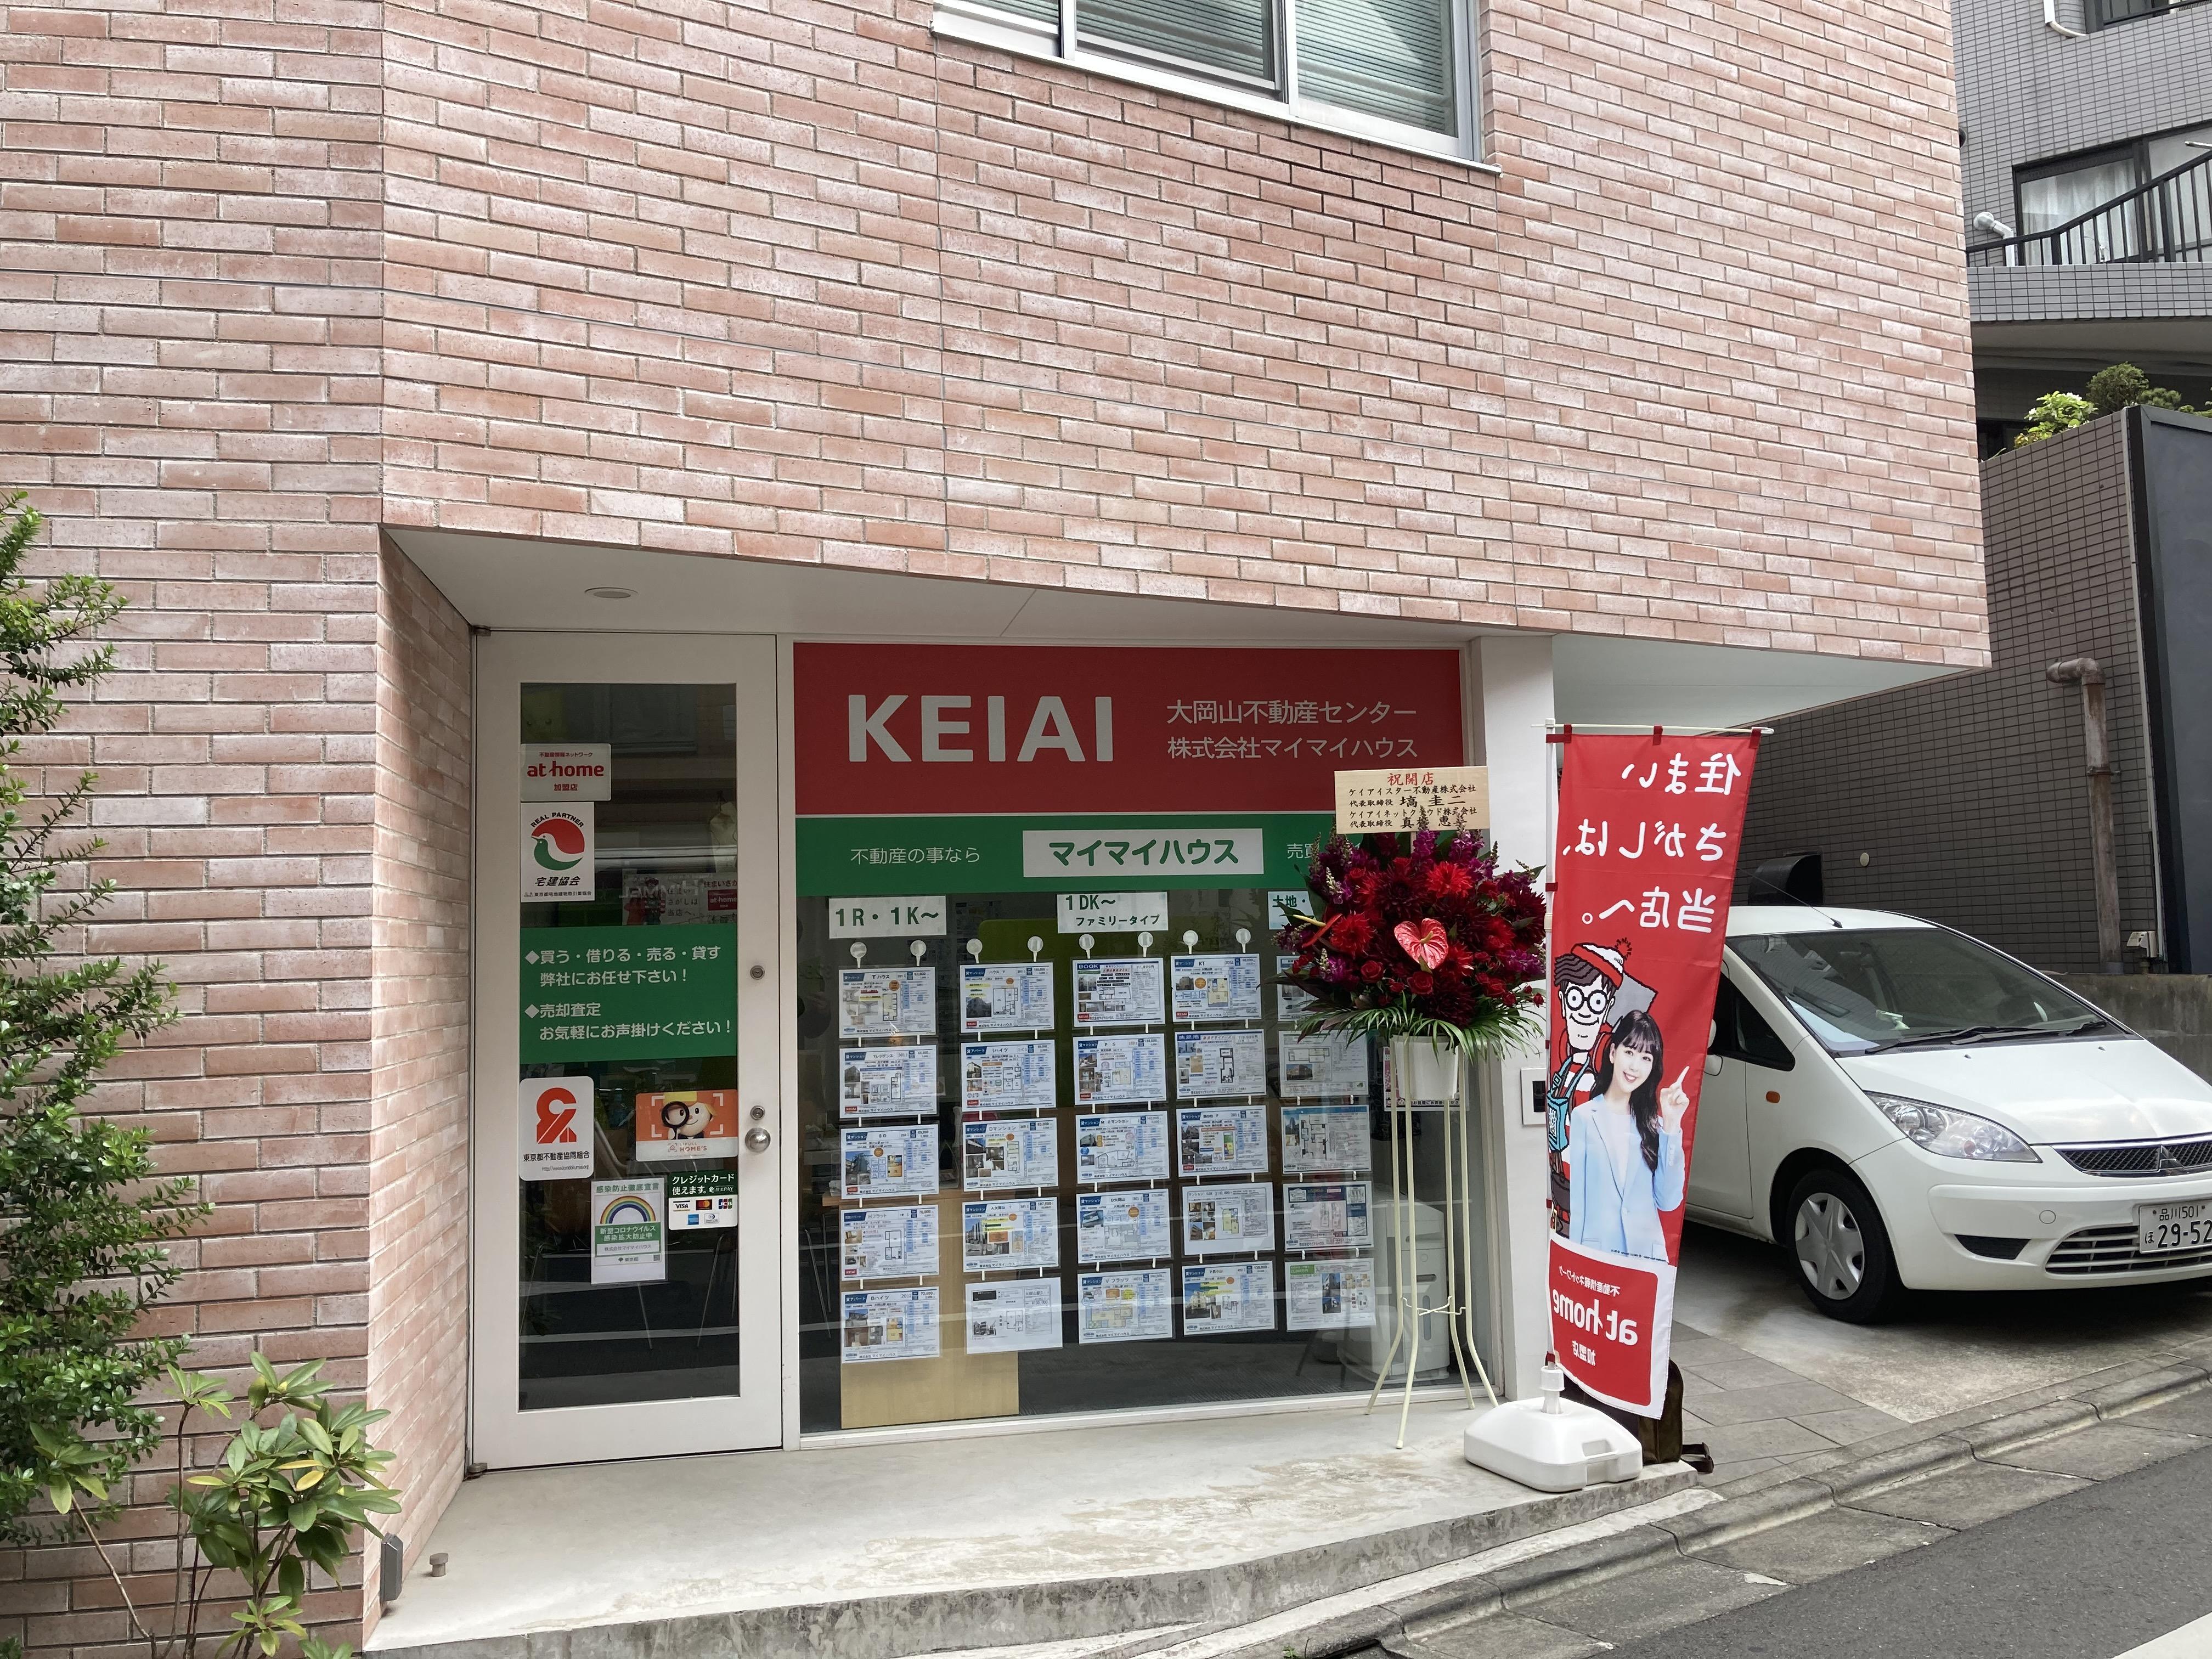 KEIAI 大岡山不動産センター